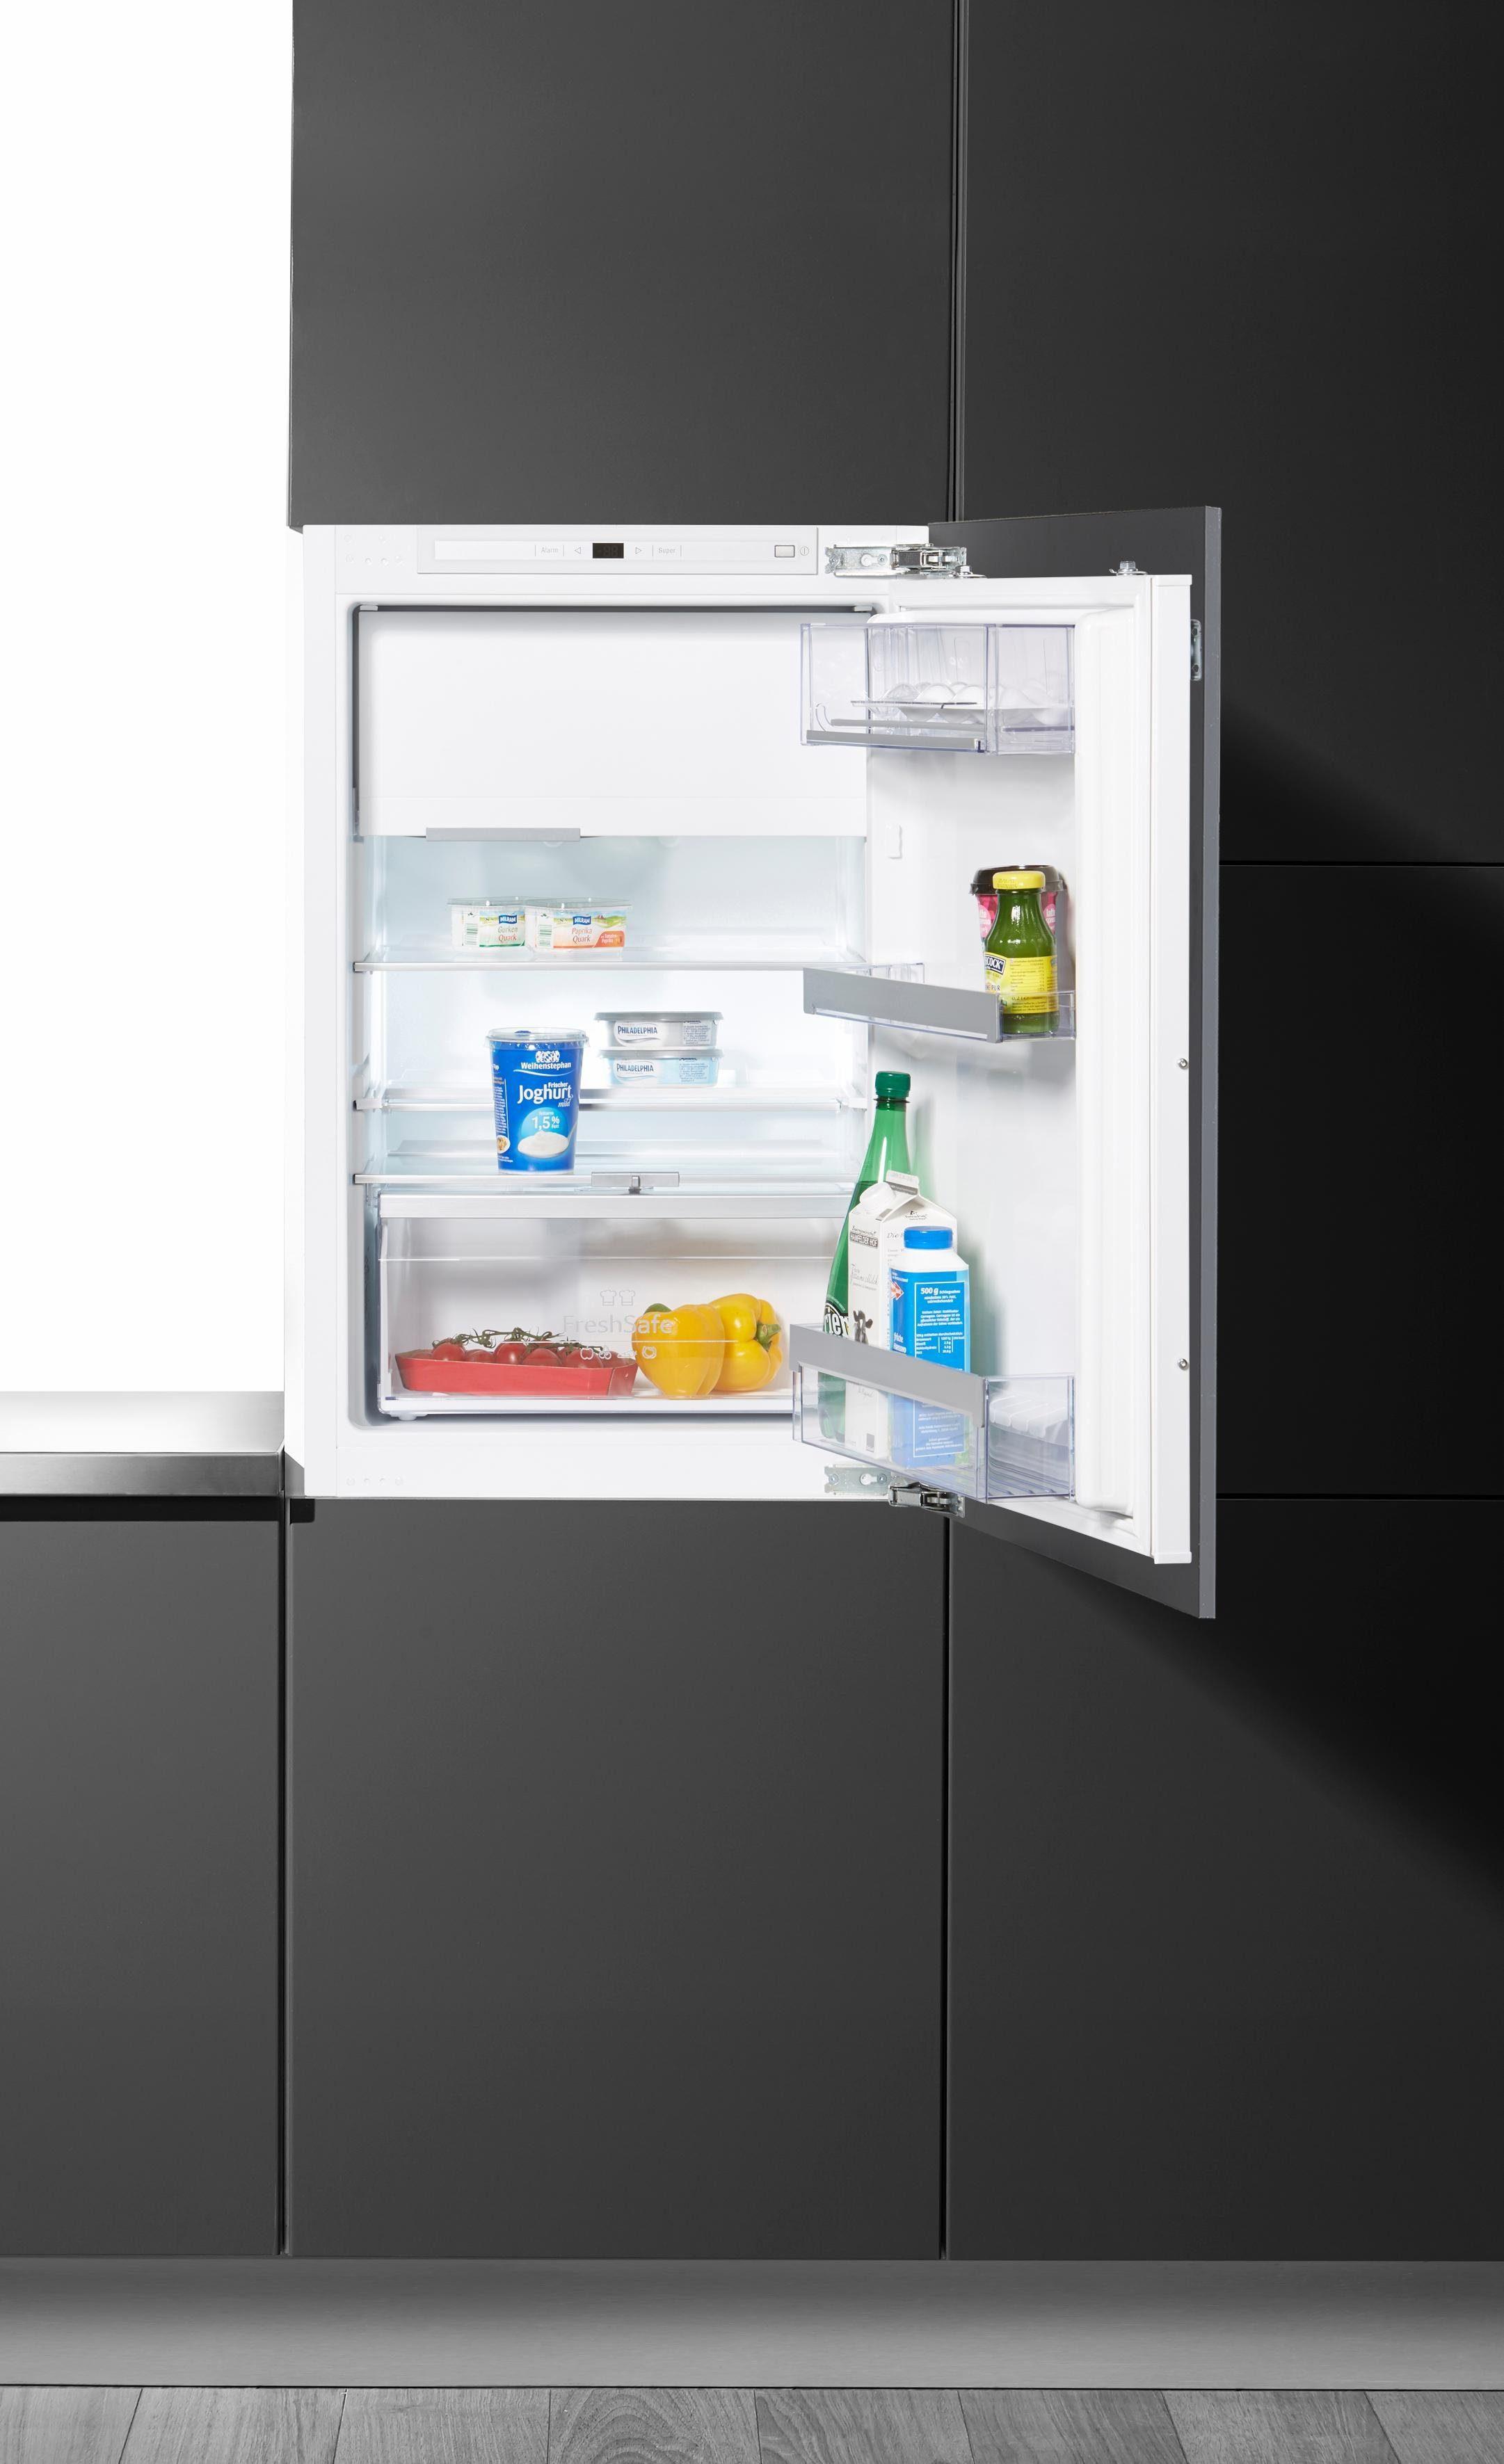 NEFF Einbaukühlschrank K246A3 / KI2223D40, 87,4 cm hoch, 55,8 cm breit, integrierbar